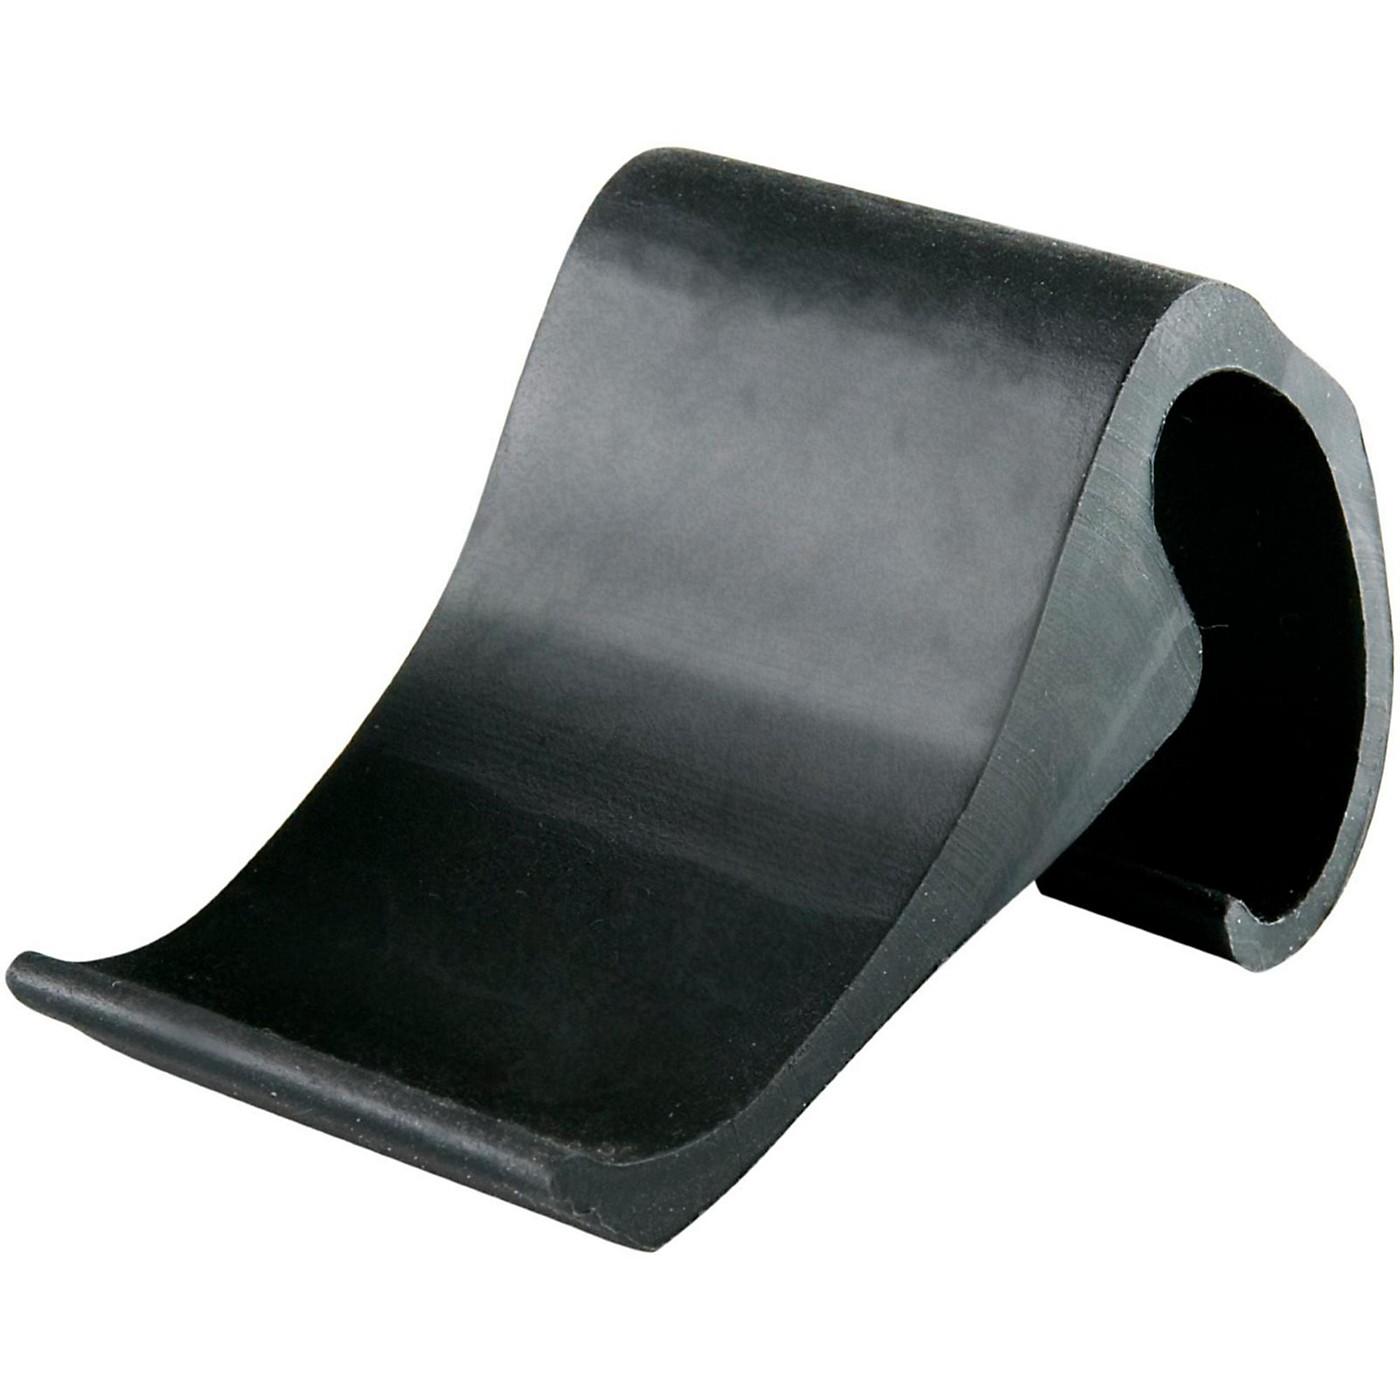 DrumClip External Drum Ring Control Clip, Standard thumbnail